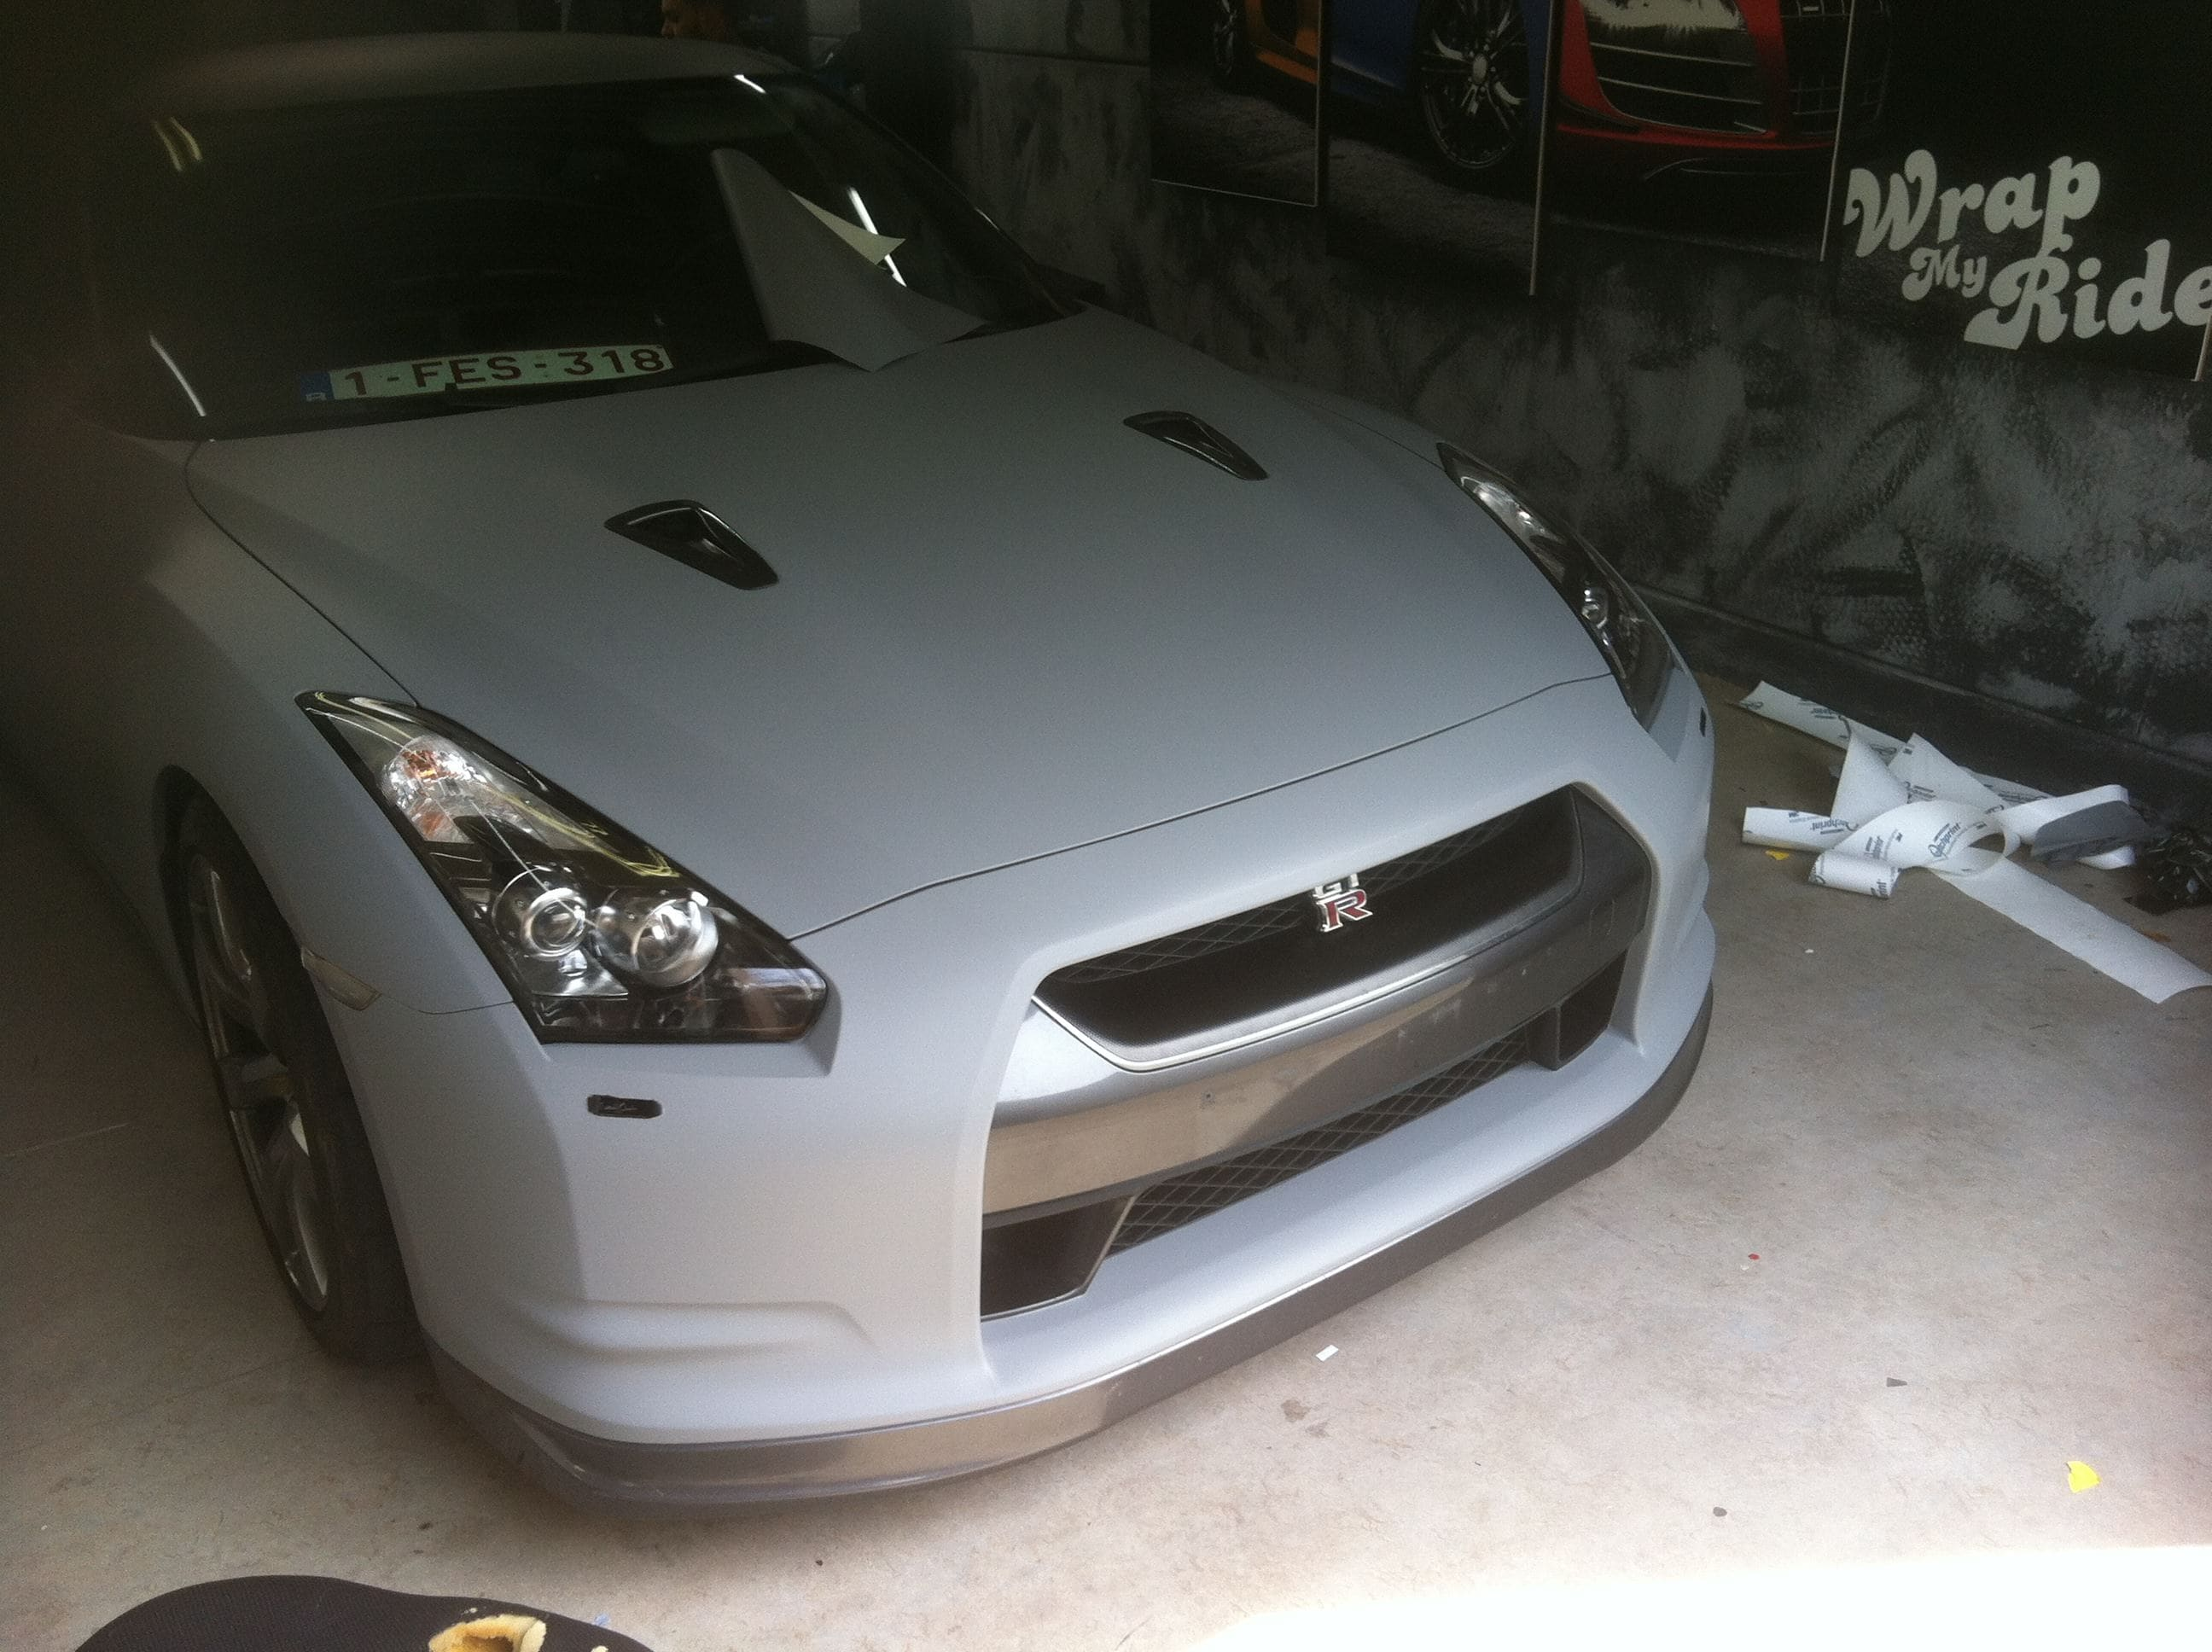 Nissan GT-R met Mat Grijze Wrap, Carwrapping door Wrapmyride.nu Foto-nr:6551, ©2021